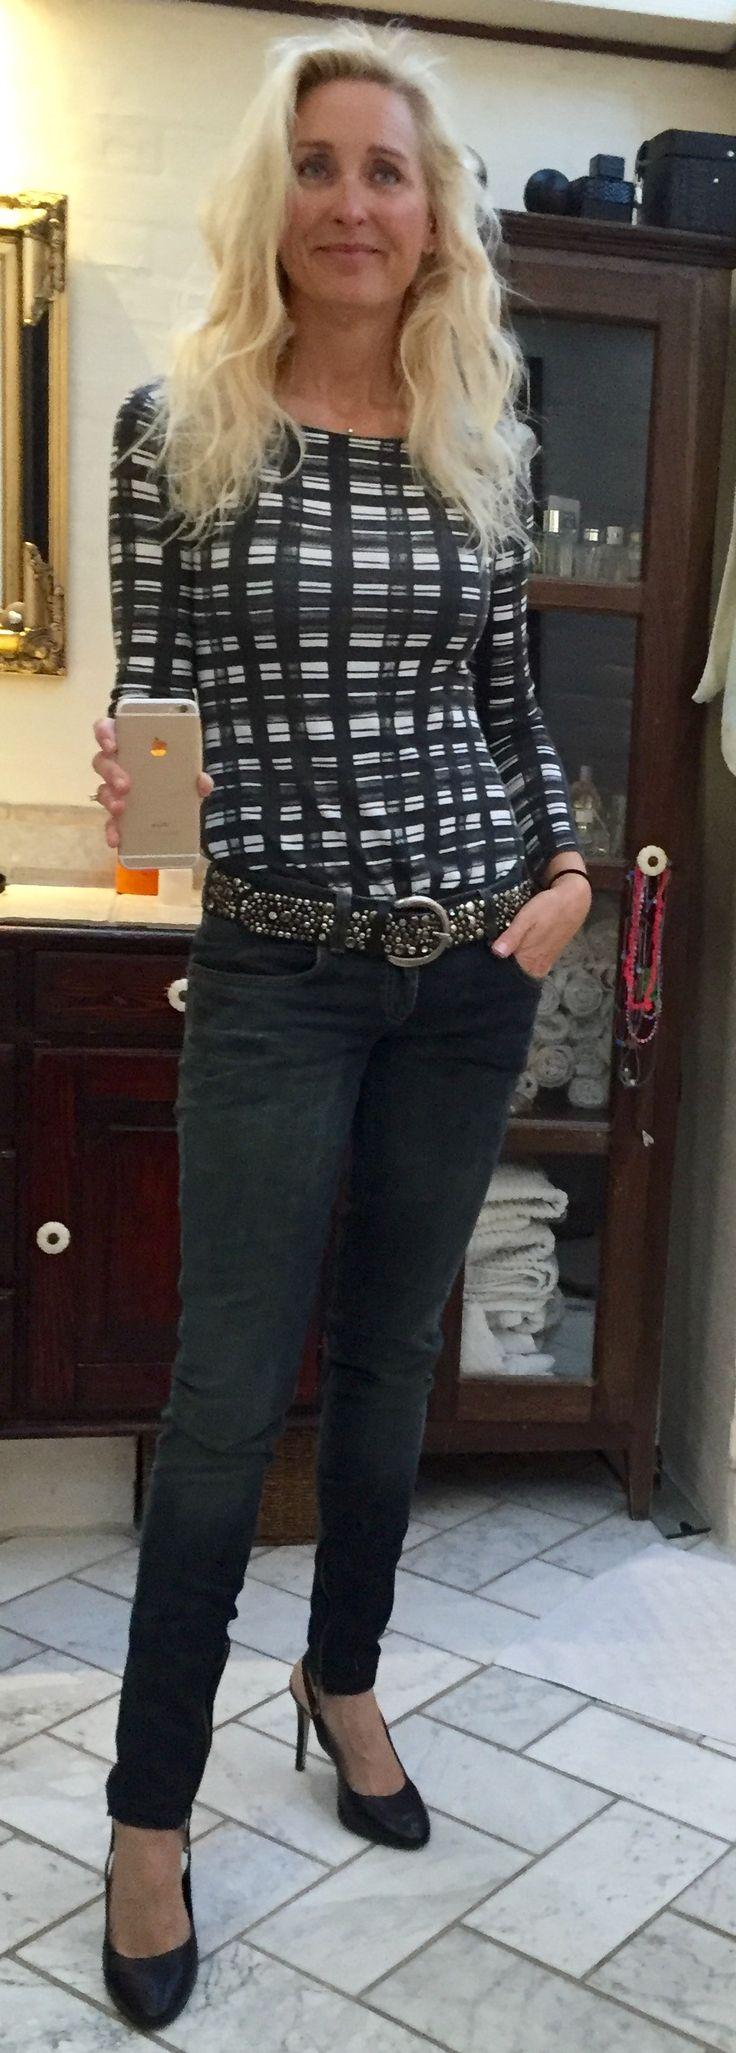 BooHoo blouse. Armani Jeans. Taupage shoes.